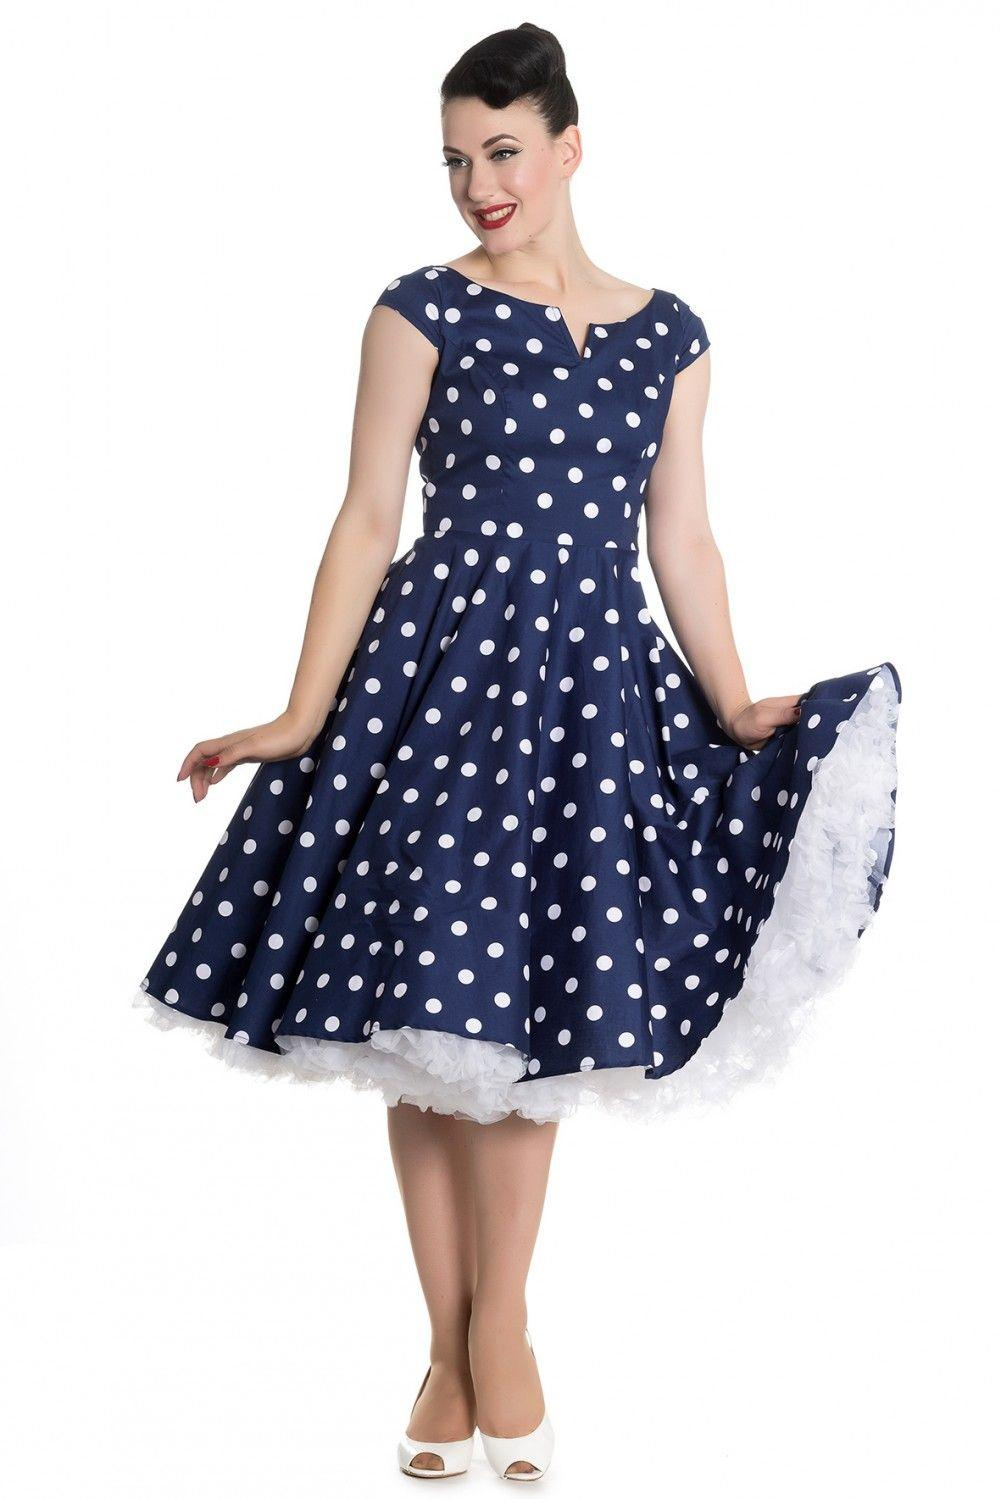 96d3ed98c7fc Køb Anni 50er mørkeblå kjole - Price  499